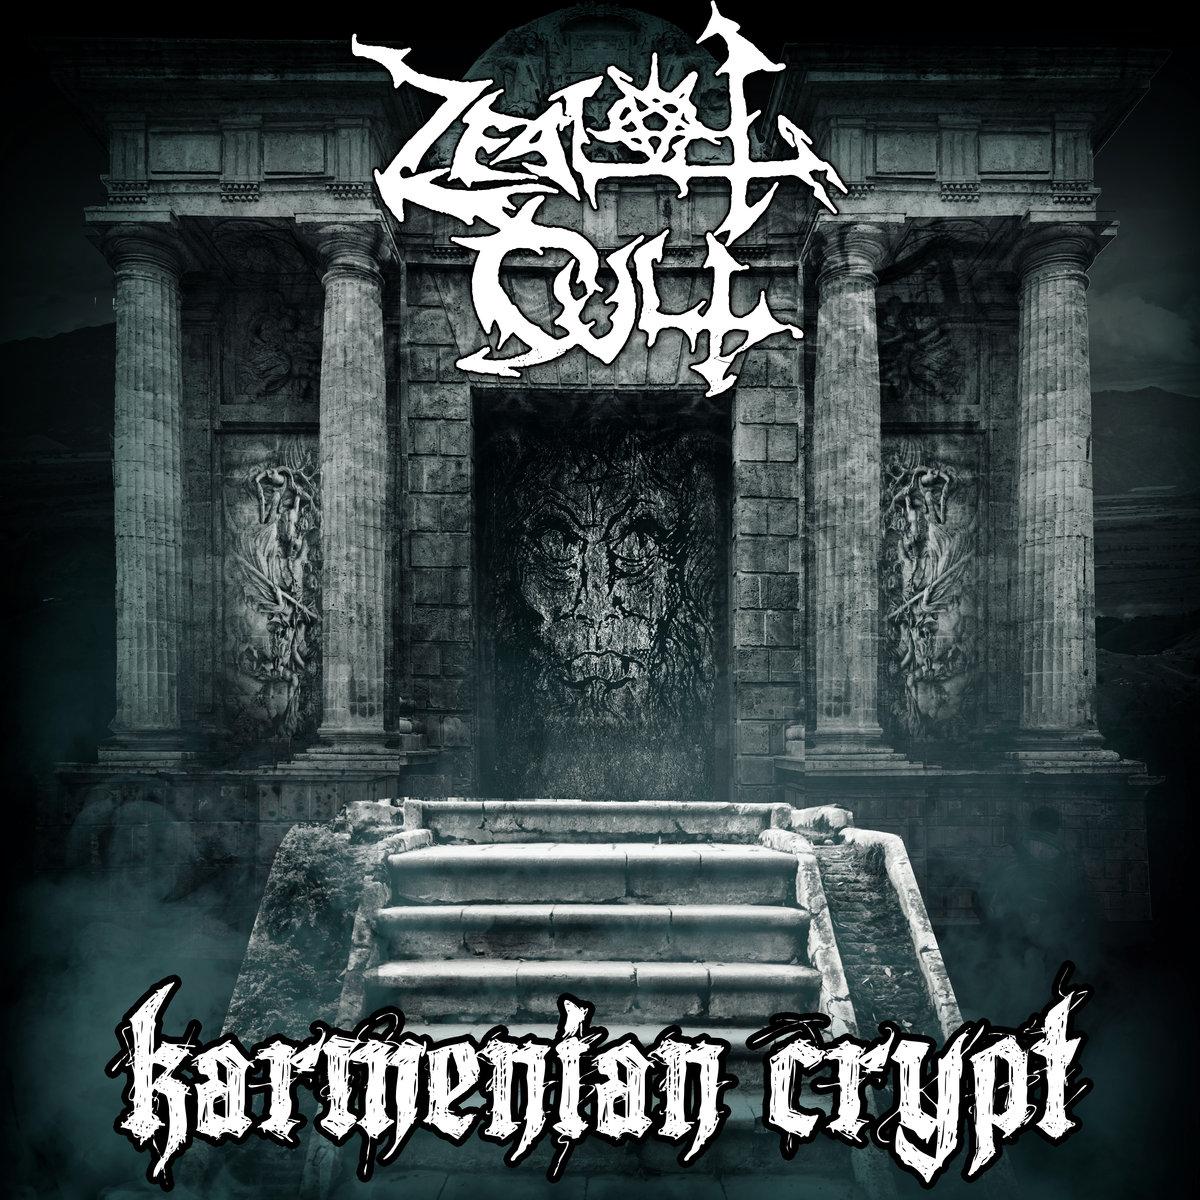 zealot-cult-karmenian-crypt